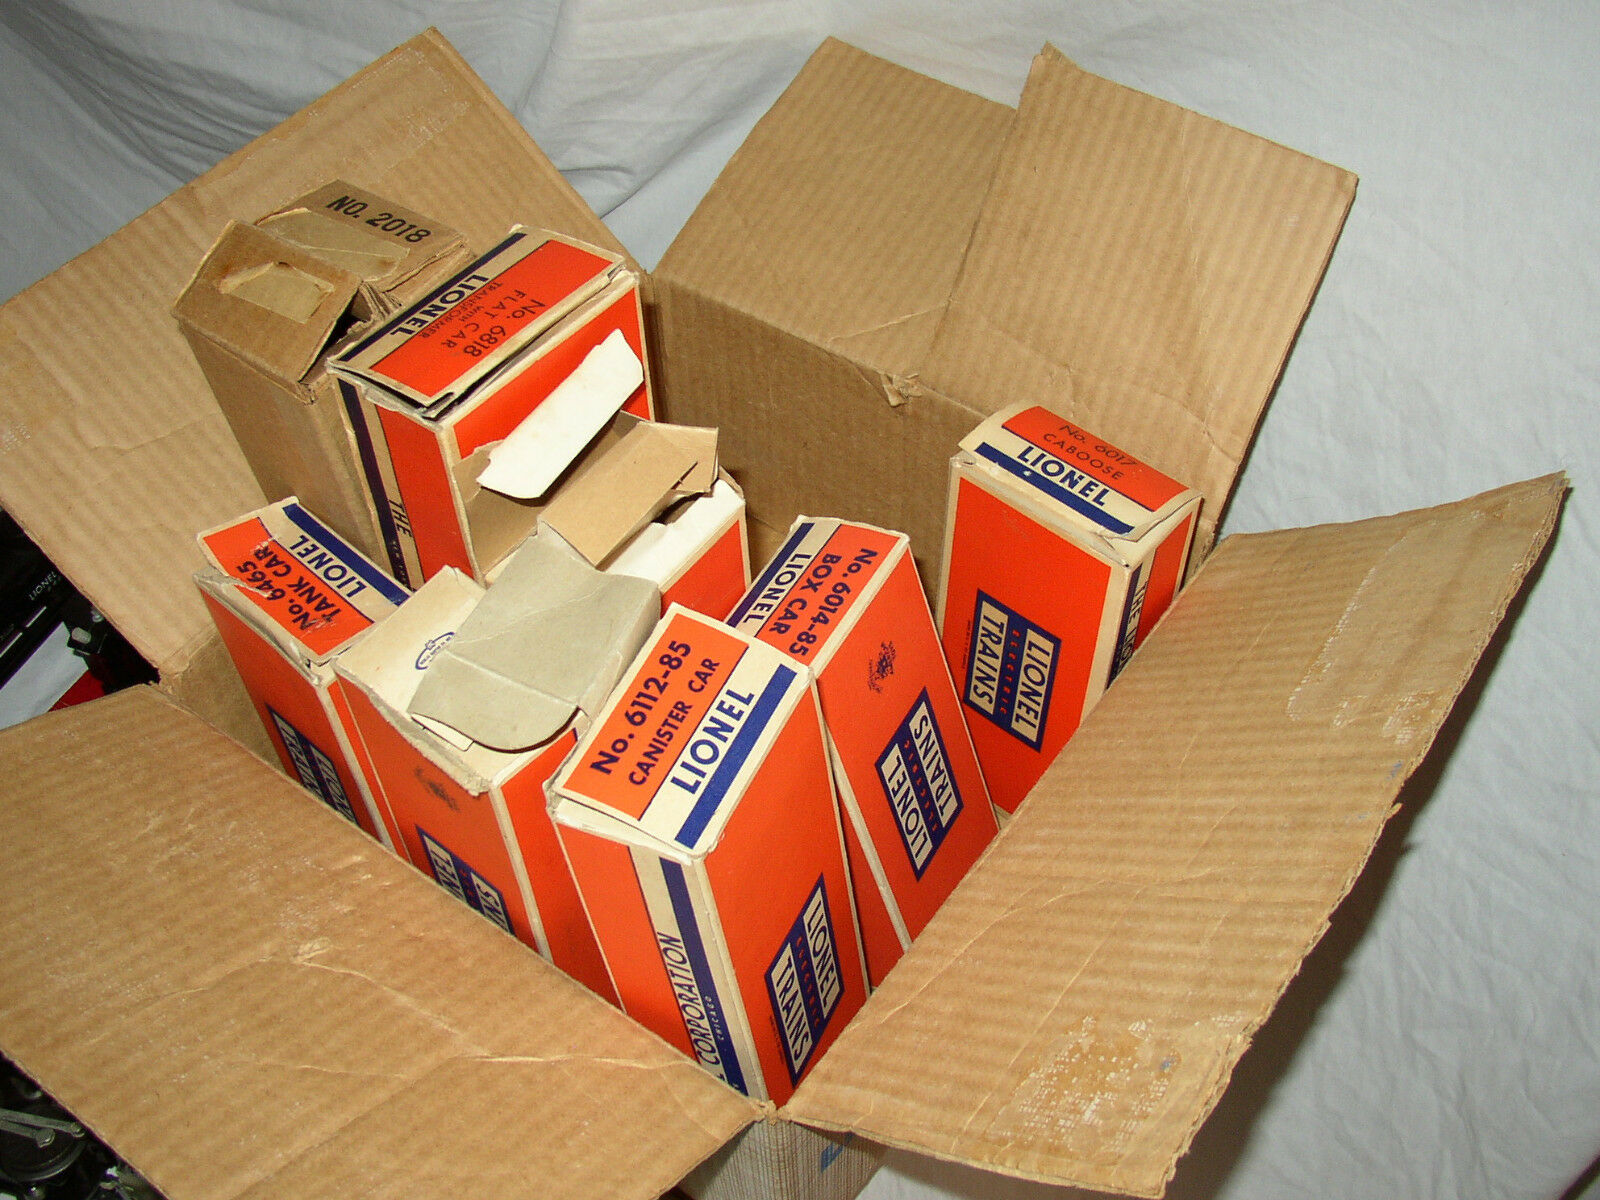 LIONEL 1597S SET IN ORIGINAL BOX NICE NICE NICE    LOT  HW-21 1fd573